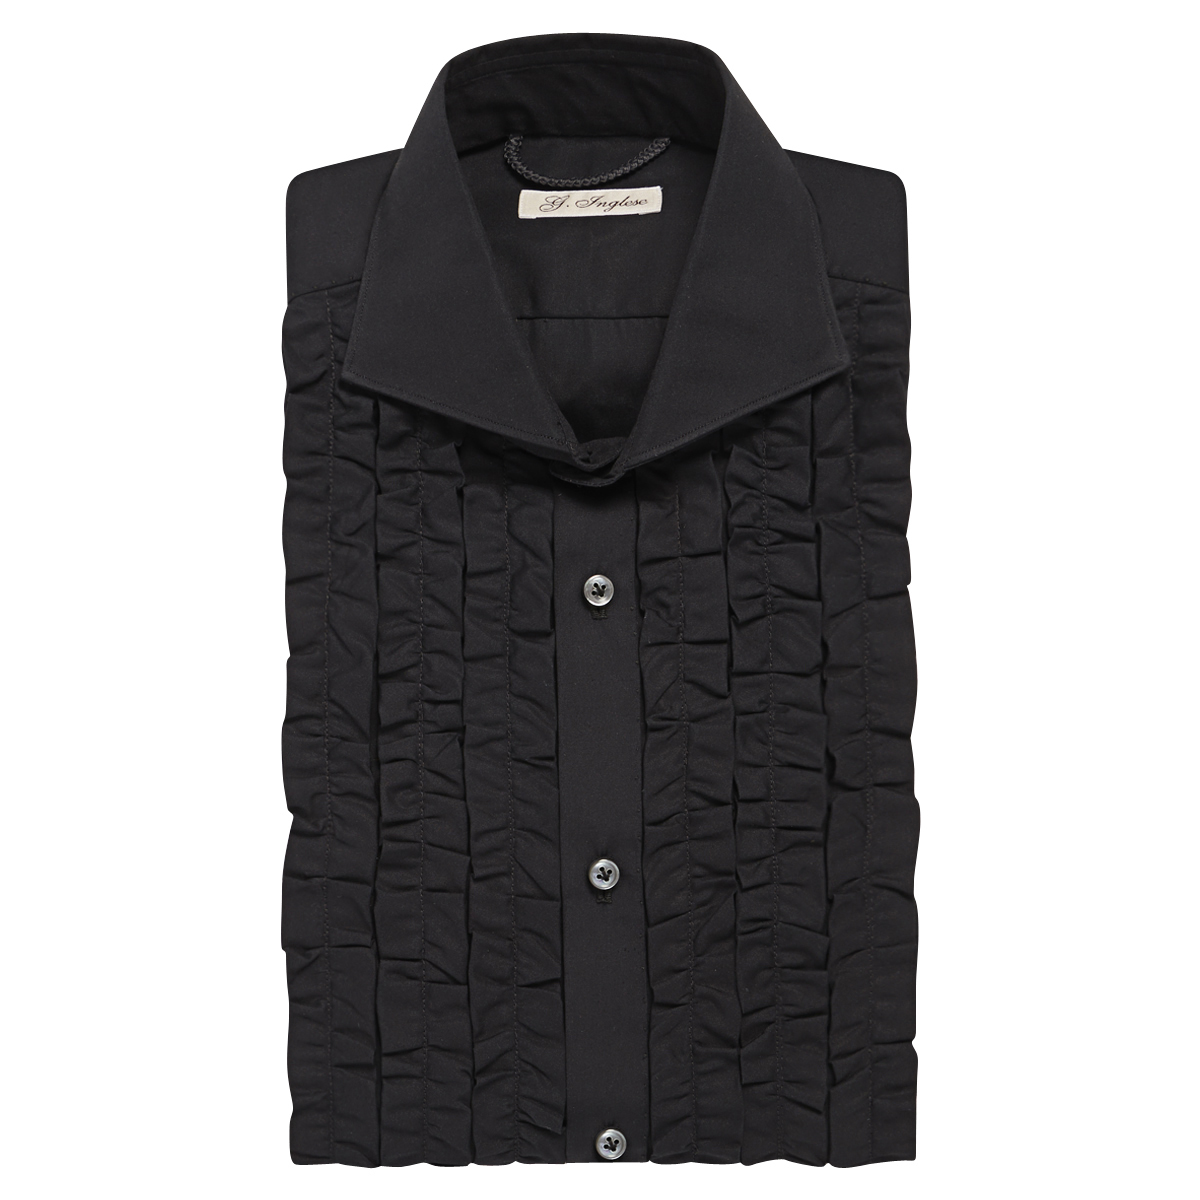 Black Cotton Poplin Ruched Tuxedo Shirt